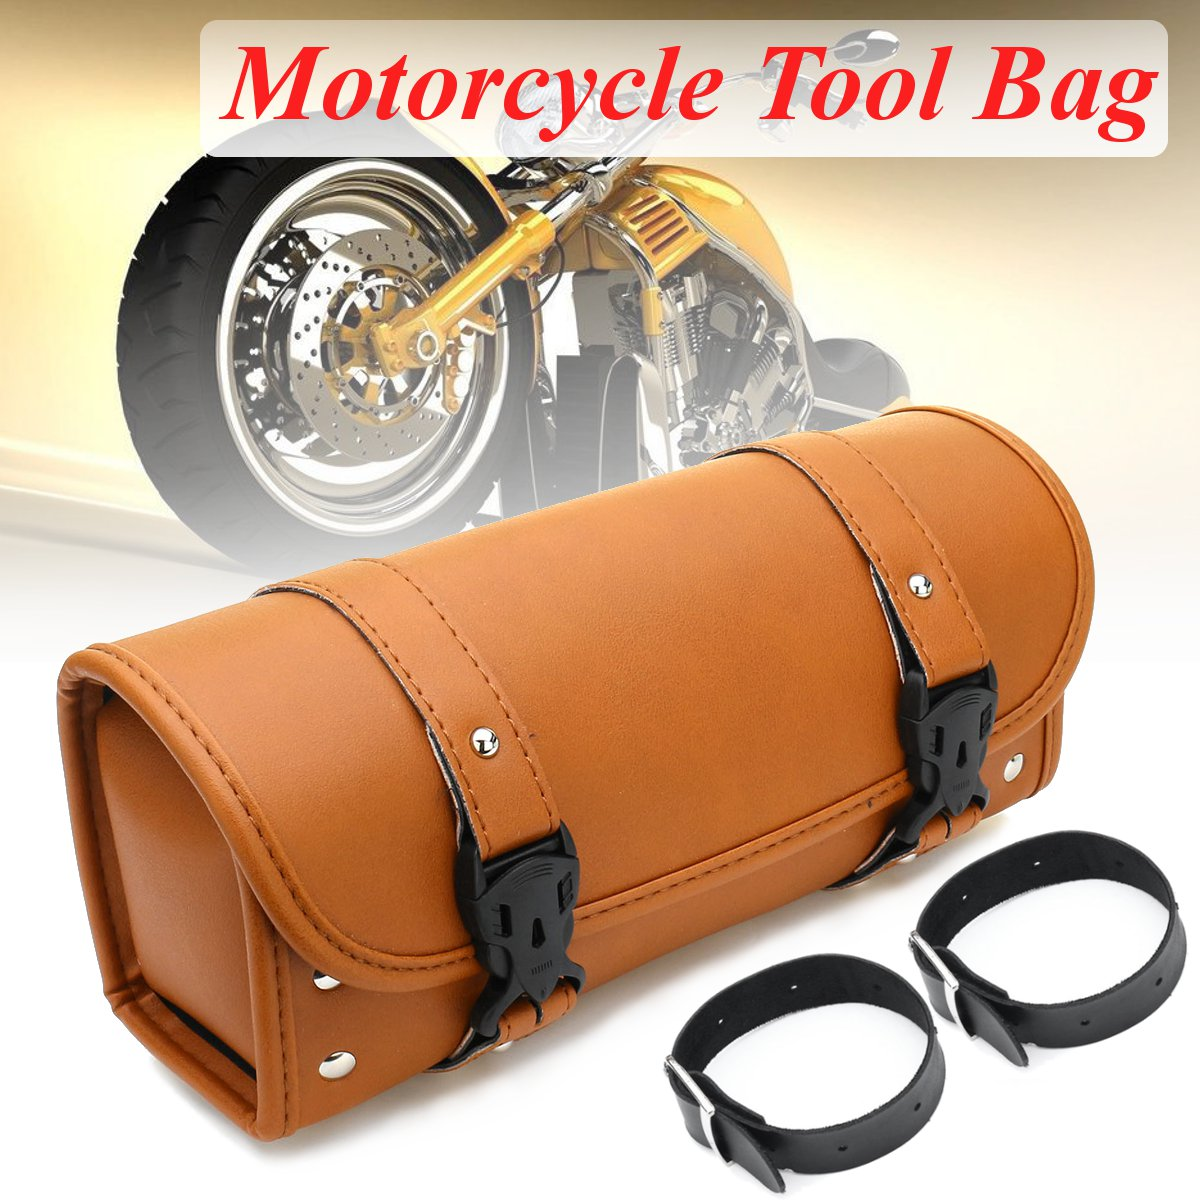 Pu Leather Motorcycle Saddlebags Side Bag Luggage Storage Bag For